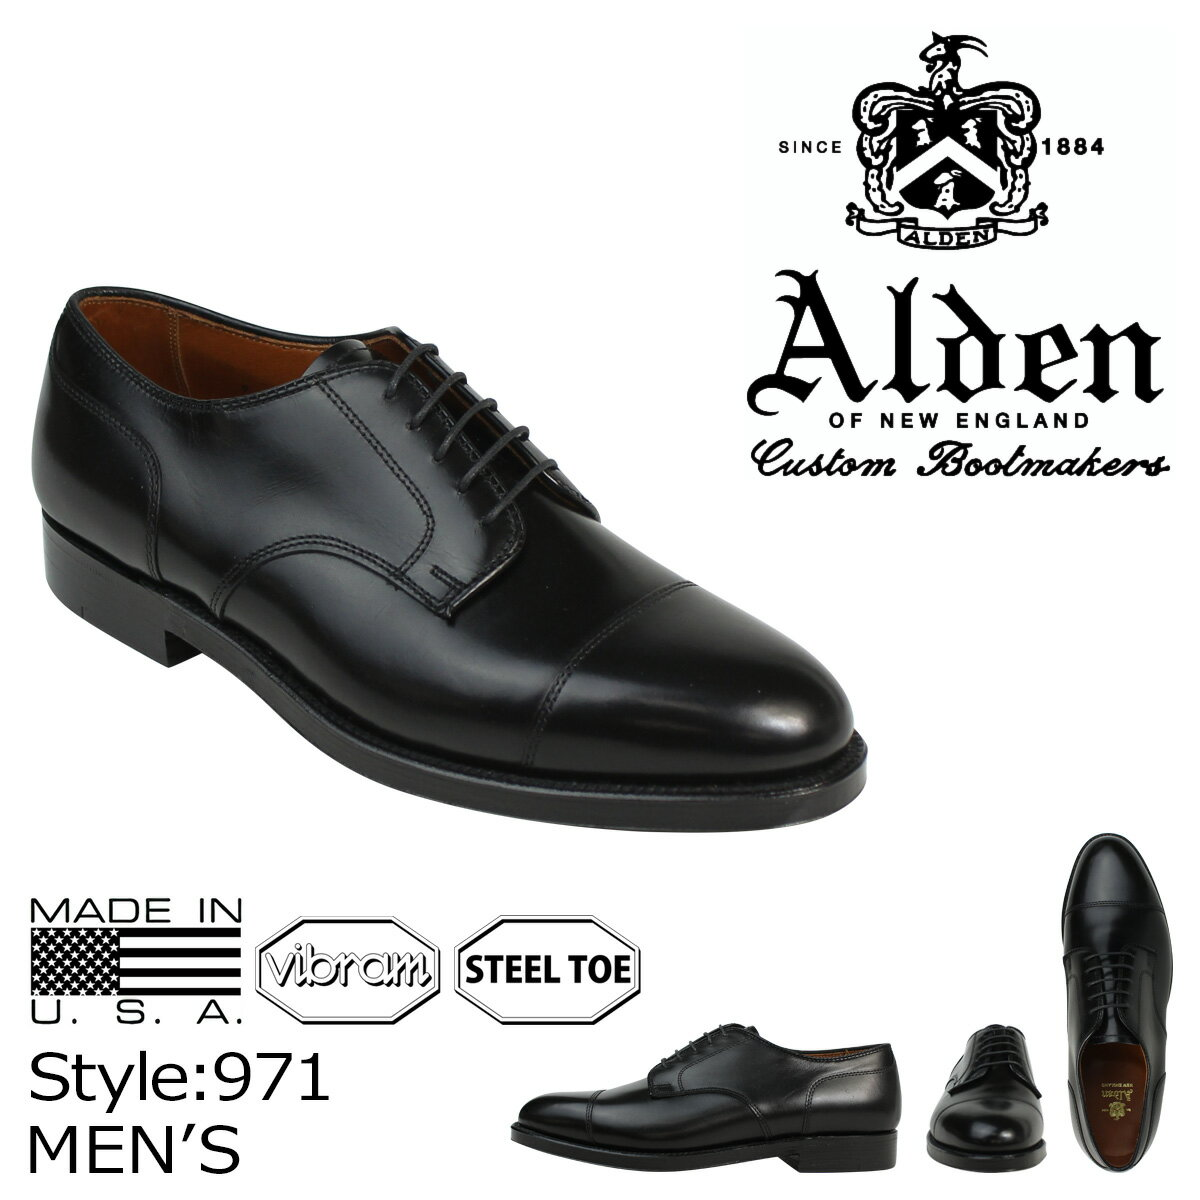 ALDEN オールデン シューズ メンズ STRAIGHT TIP BLUCHER Dワイズ 971 [1/12 追加入荷]